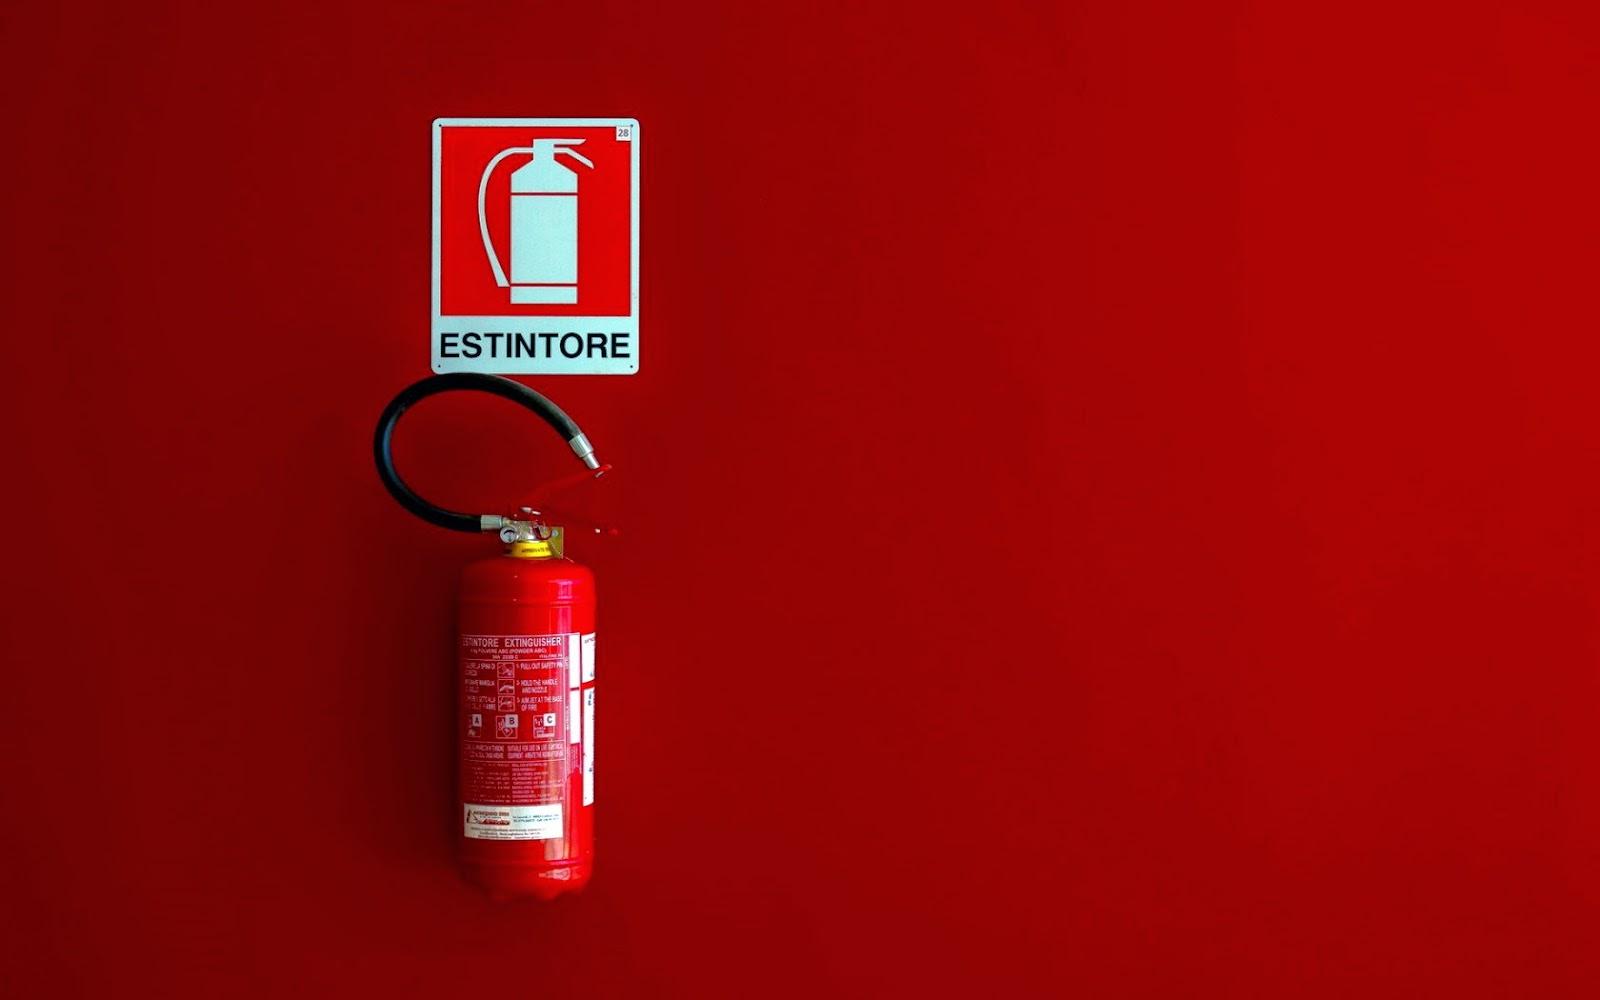 Extintor | Comprar extintores en Quito